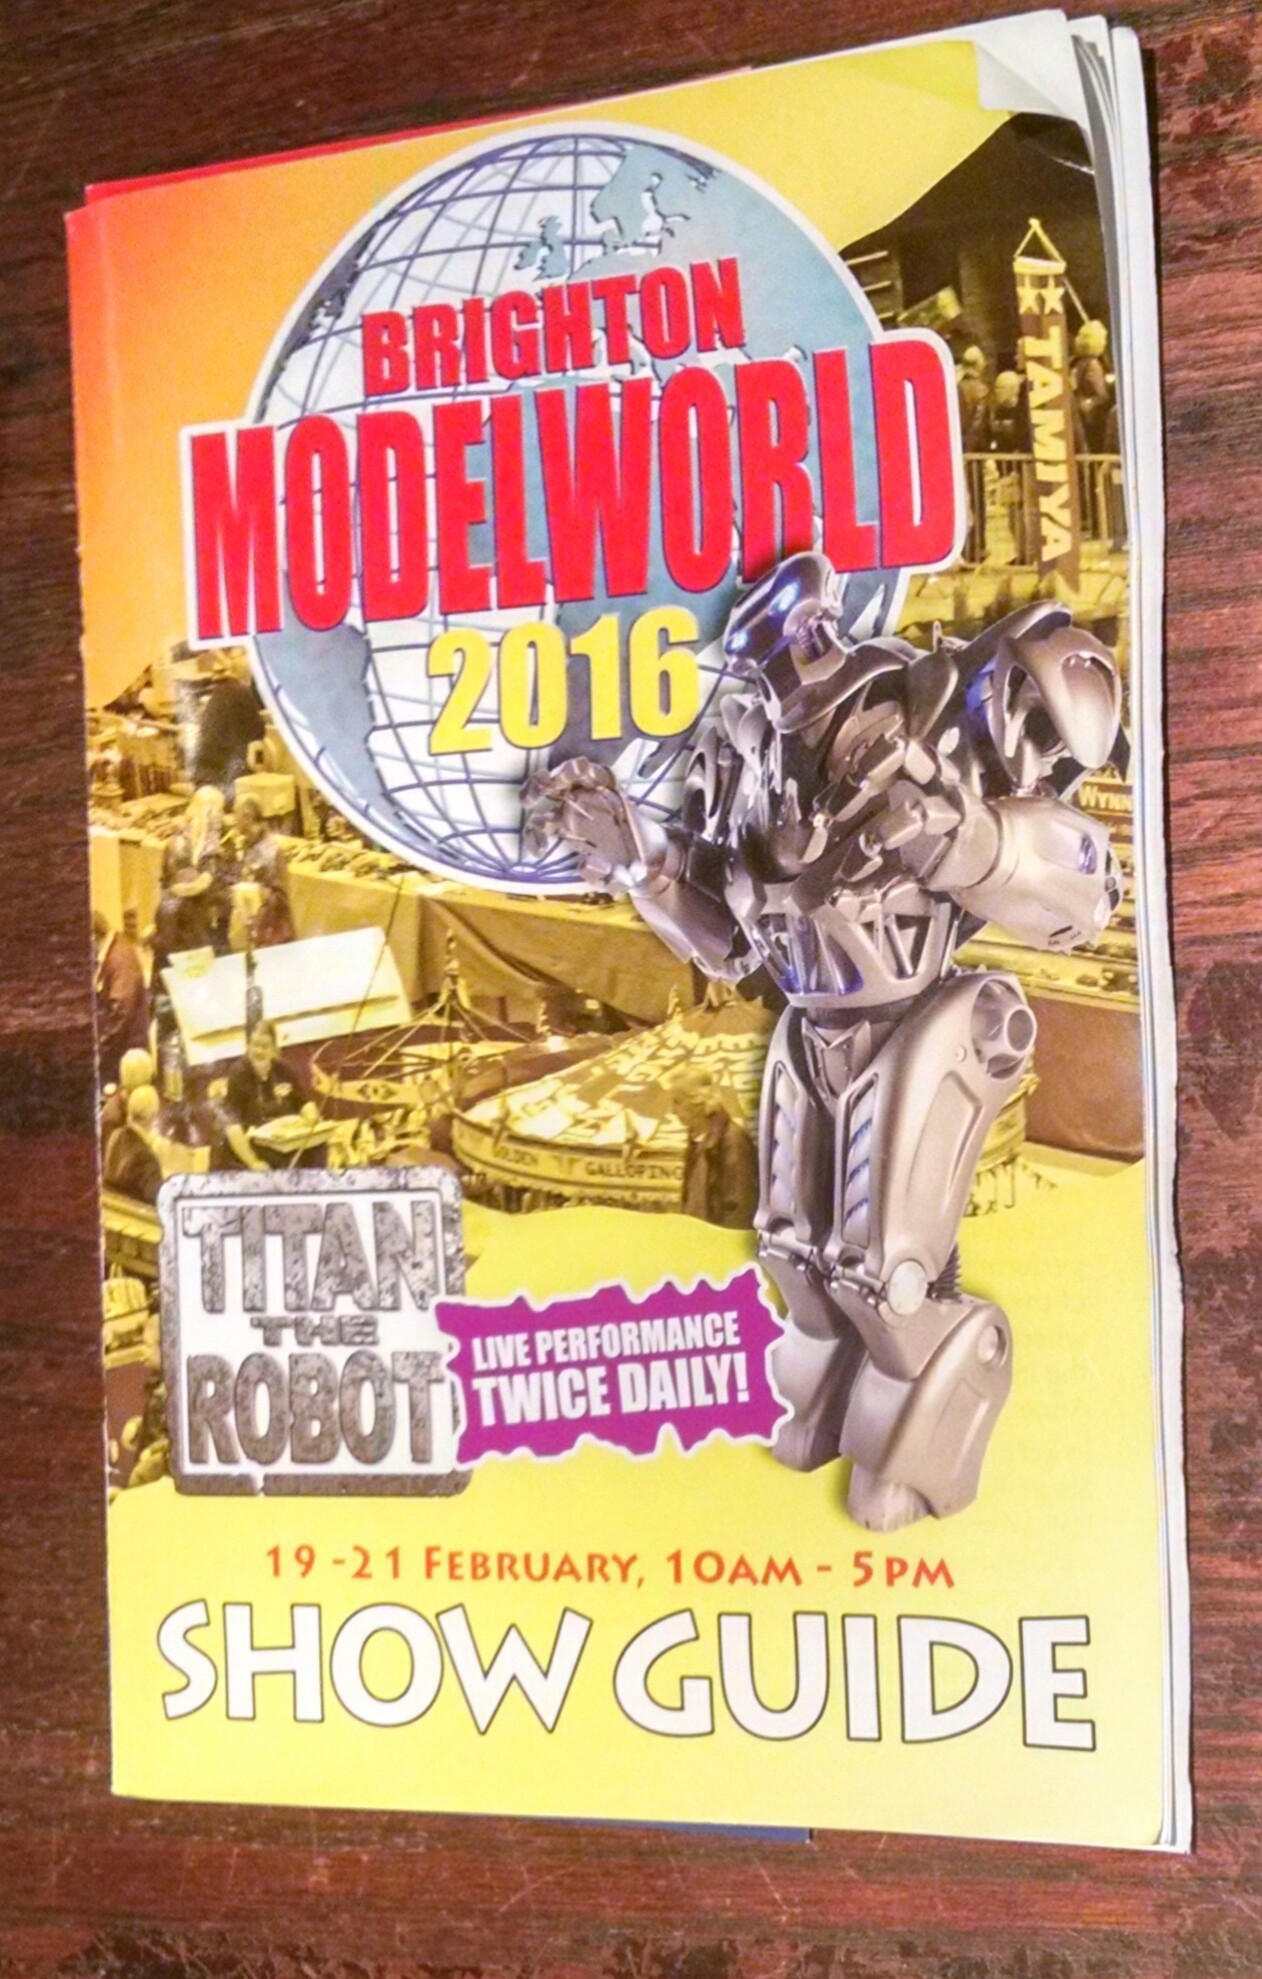 Brighton Modelworld 2016